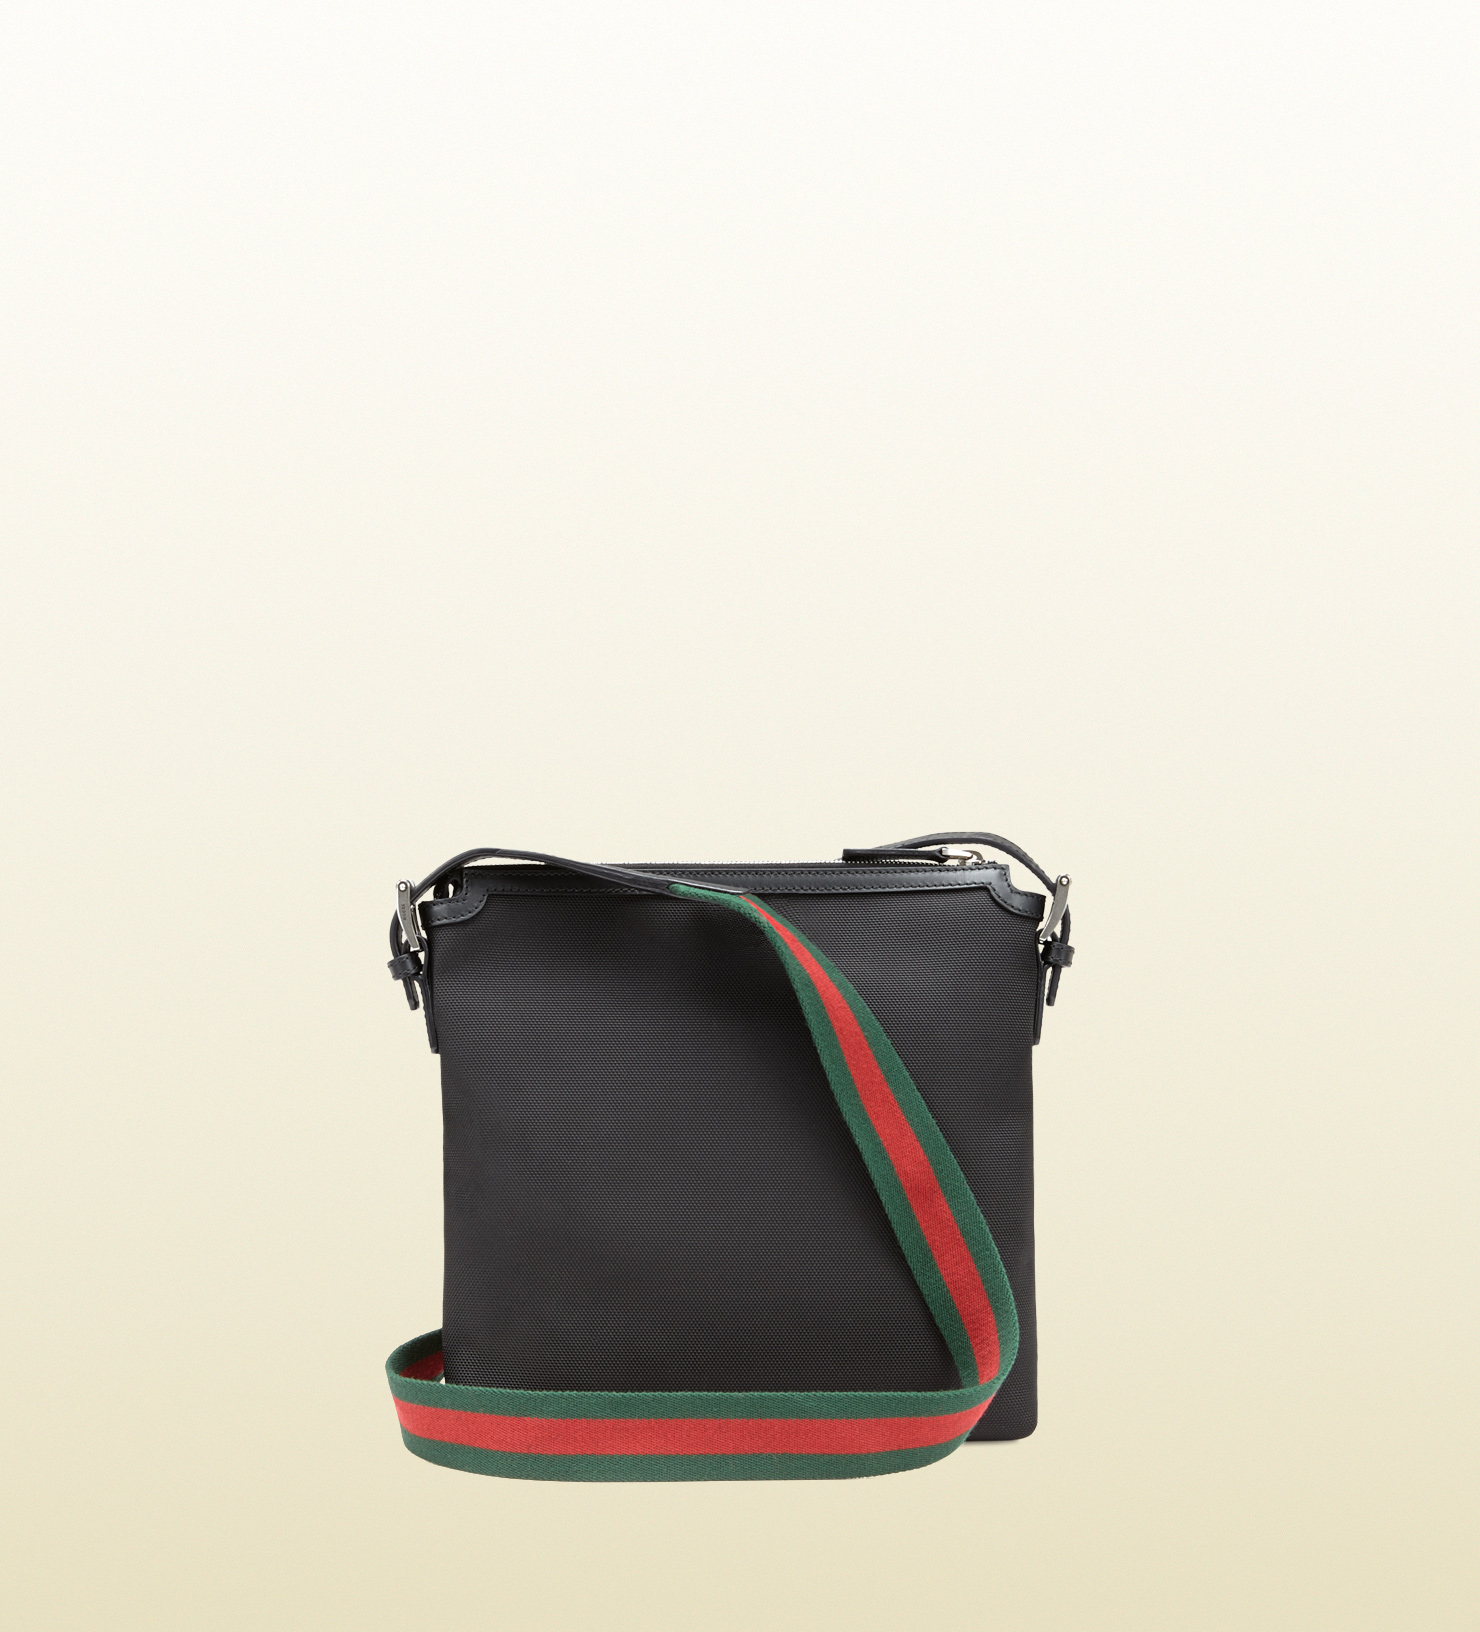 86cdcba03b96 Gucci Techno Canvas Messenger Bag in Black for Men - Lyst